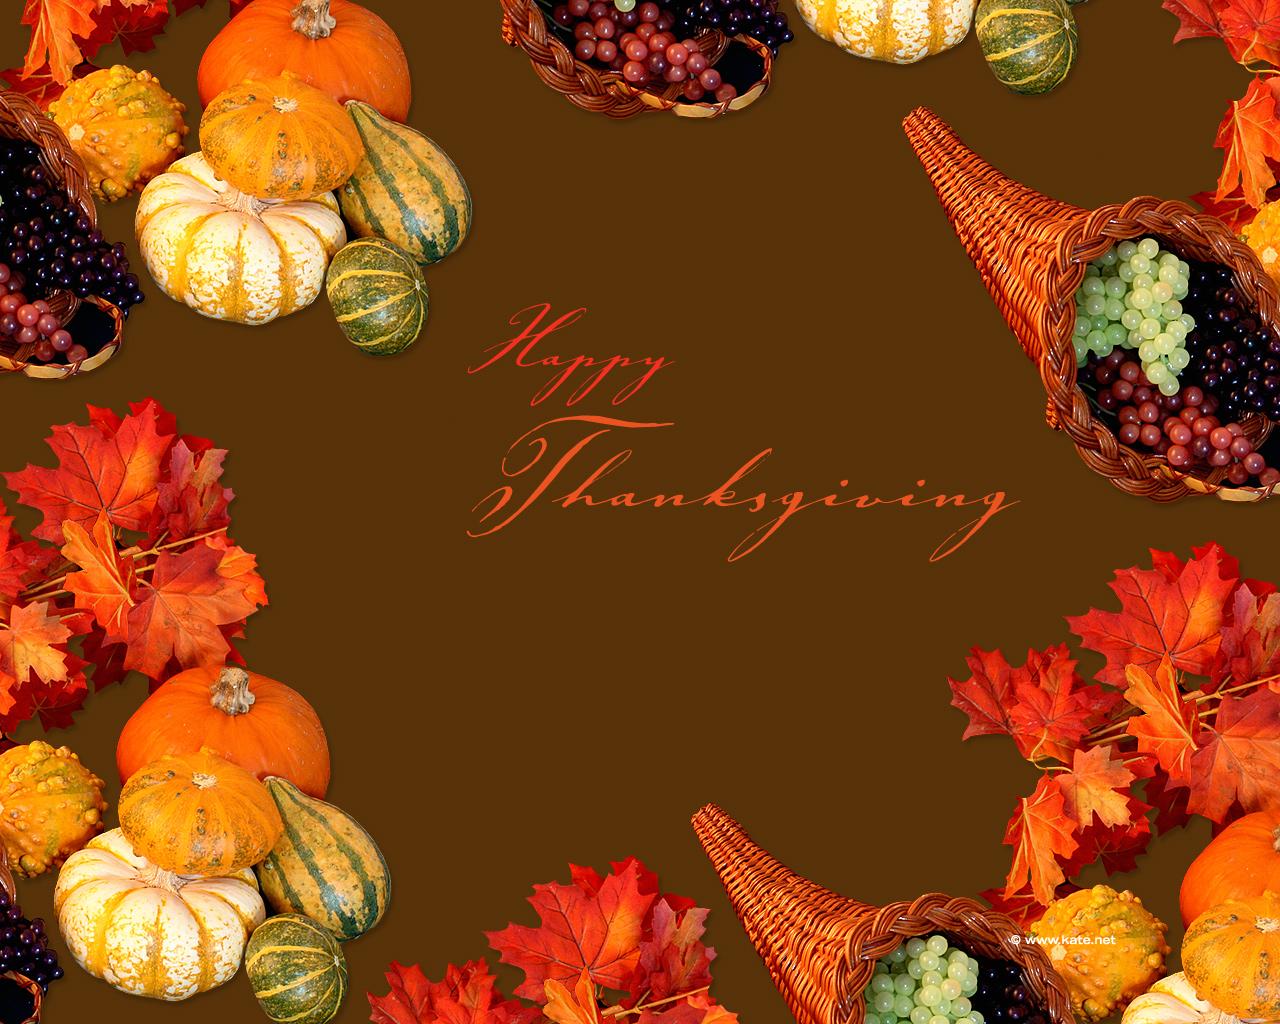 Wrestling news center happy thanksgiving - Thanksgiving day wallpaper 3d ...